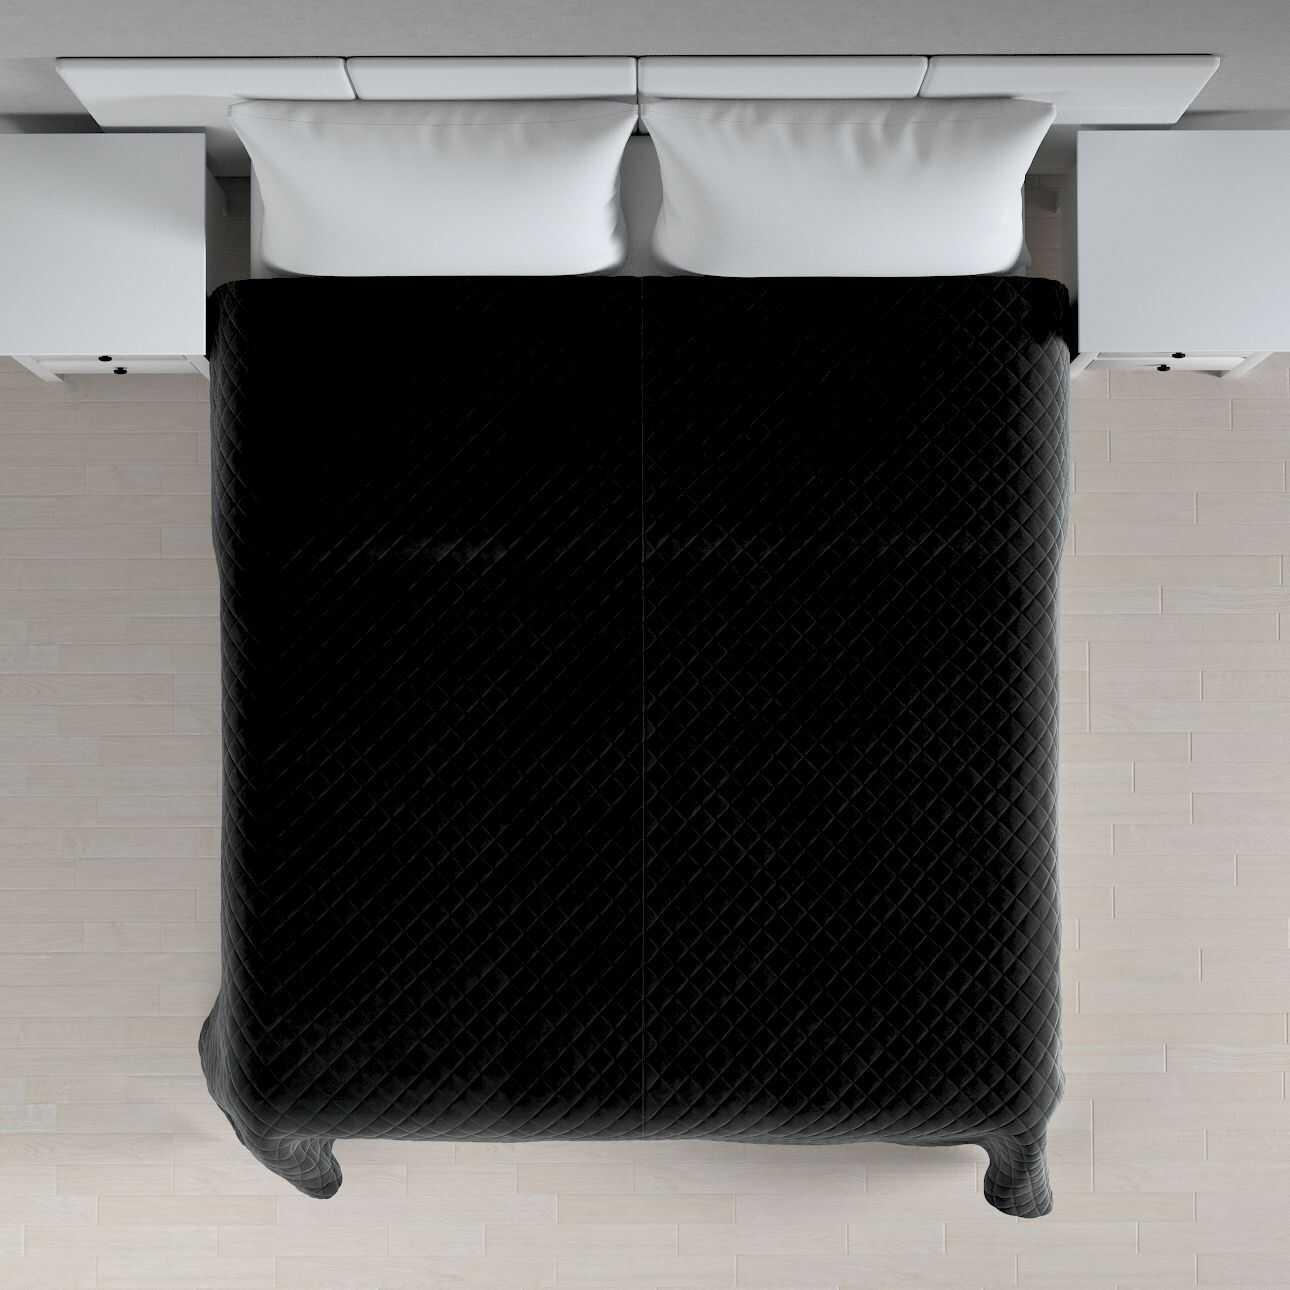 Narzuta pikowana w romby, głęboka czerń, szer.210  dł.170 cm, Velvet